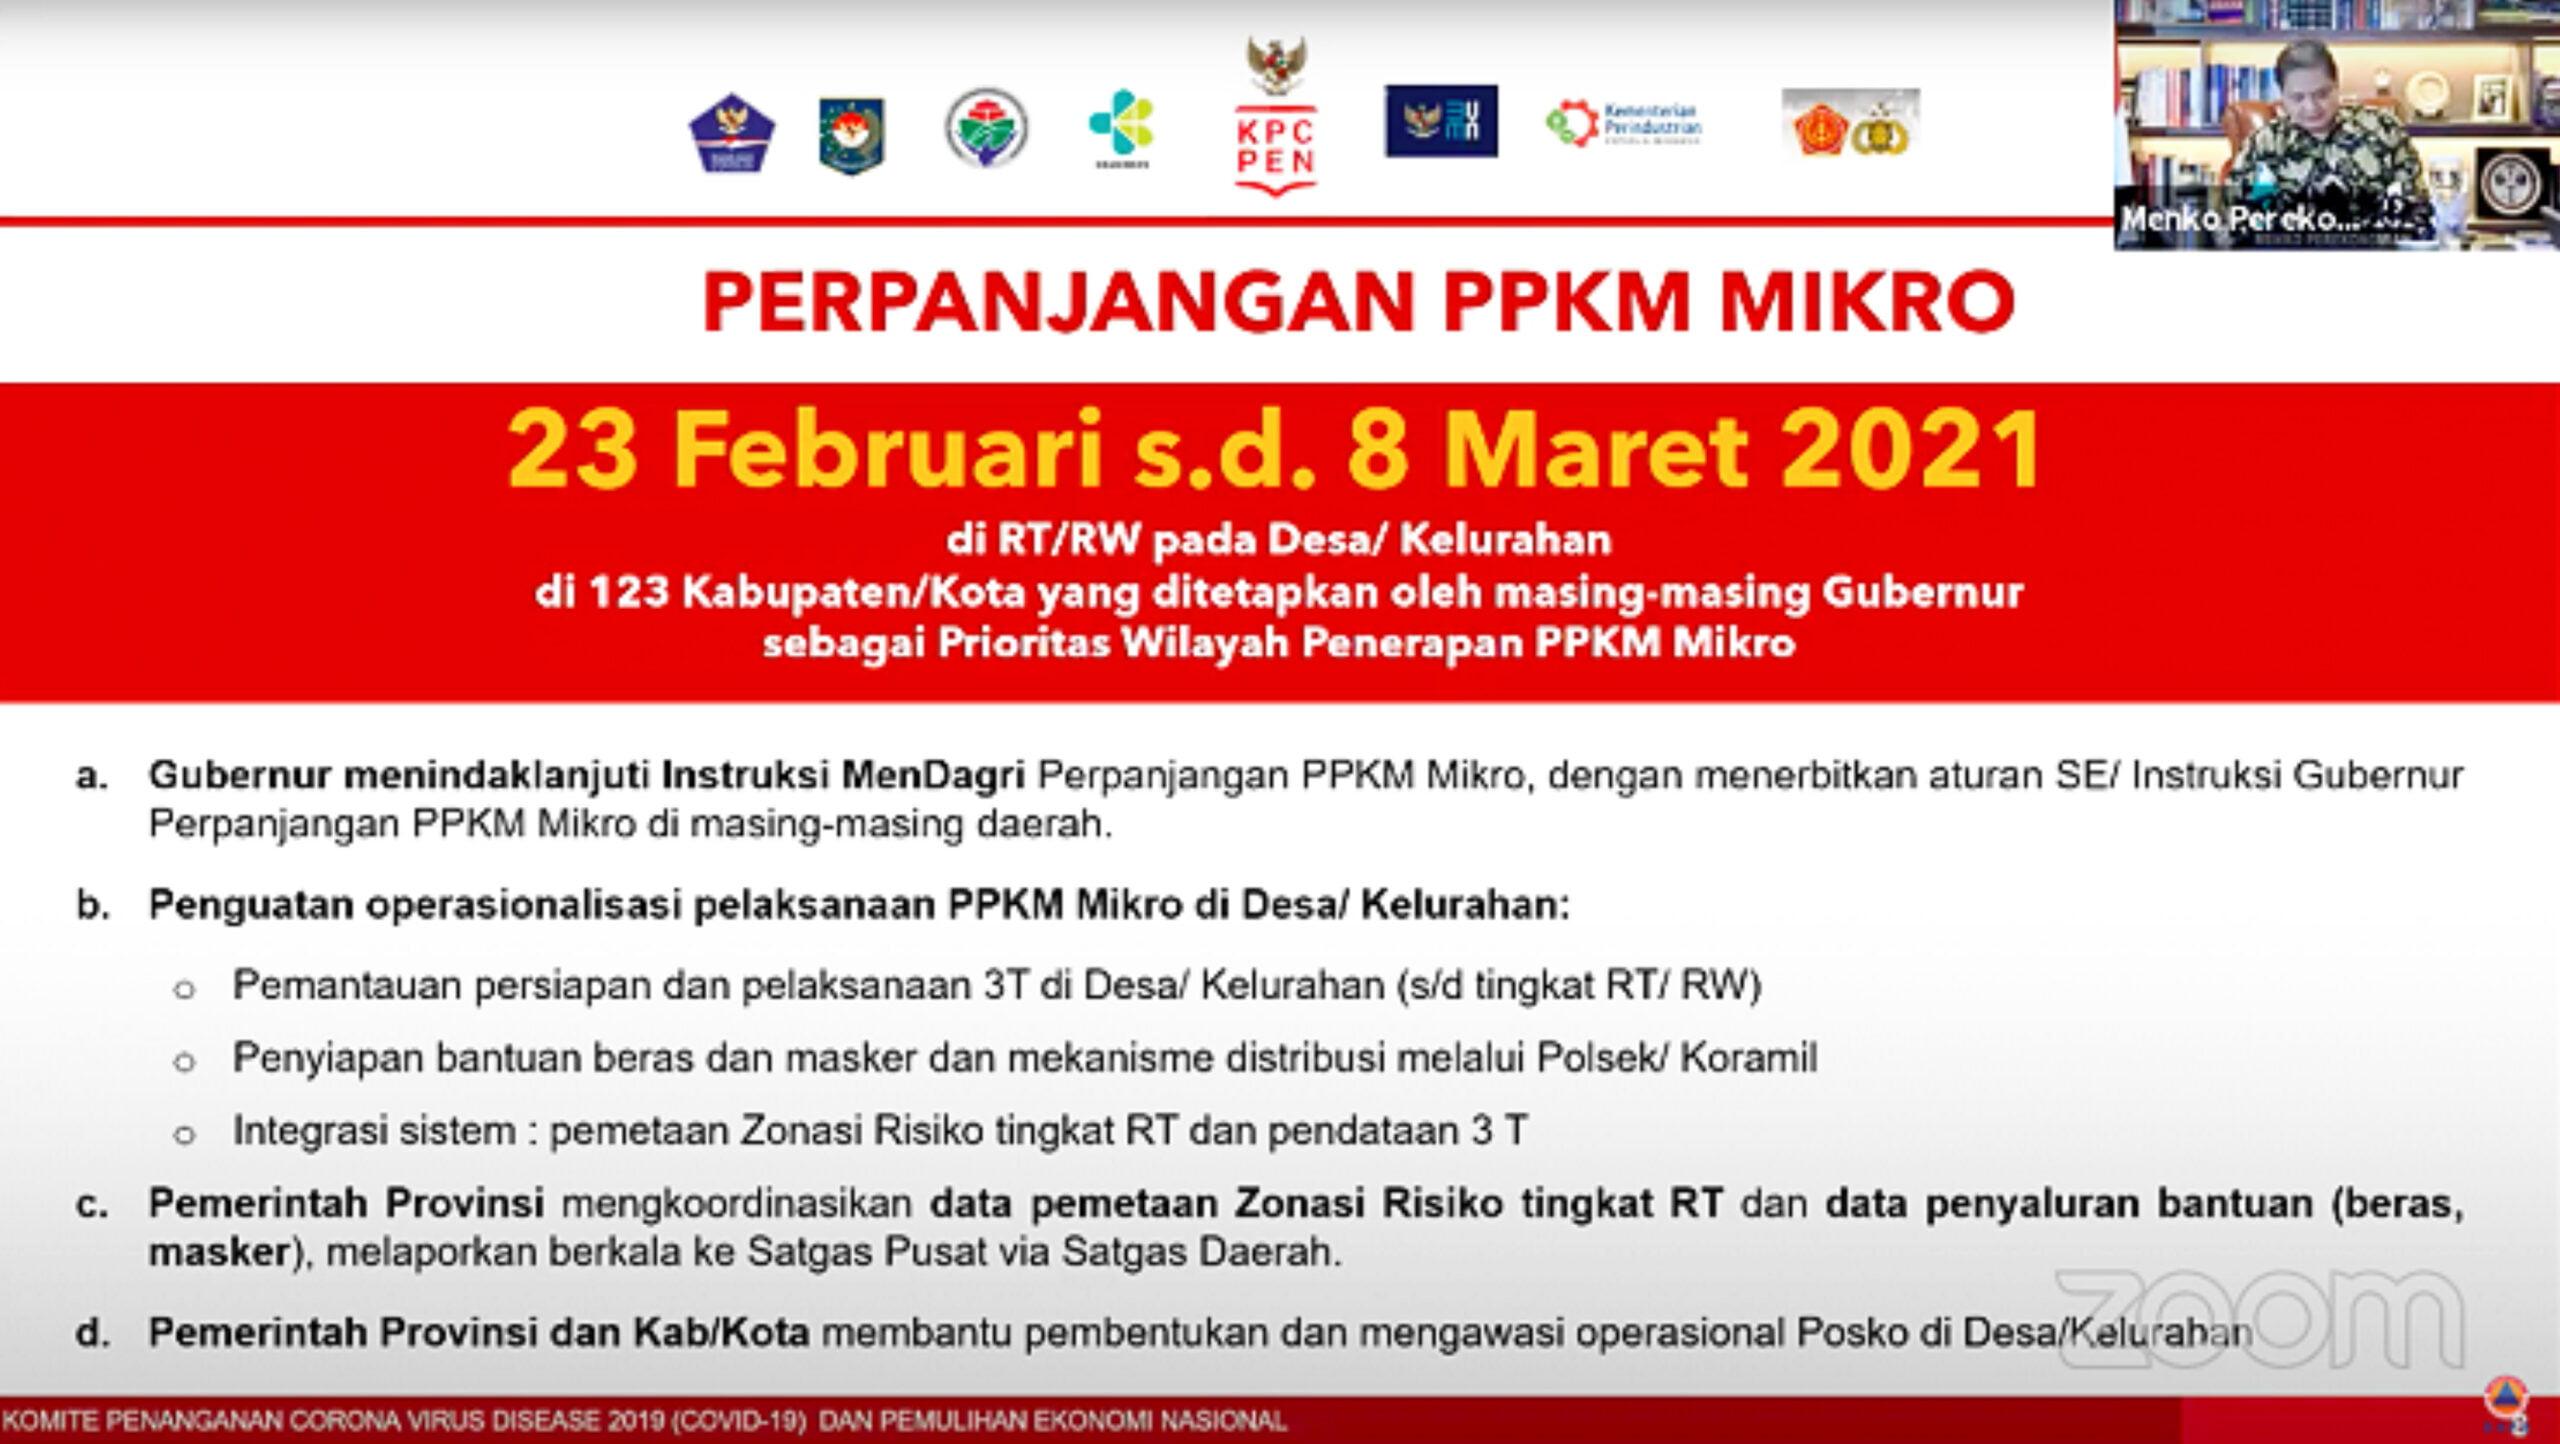 PPKM Berskala Mikro Jawa dan Bali Diperpanjang Hingga 8 Maret 2021 233